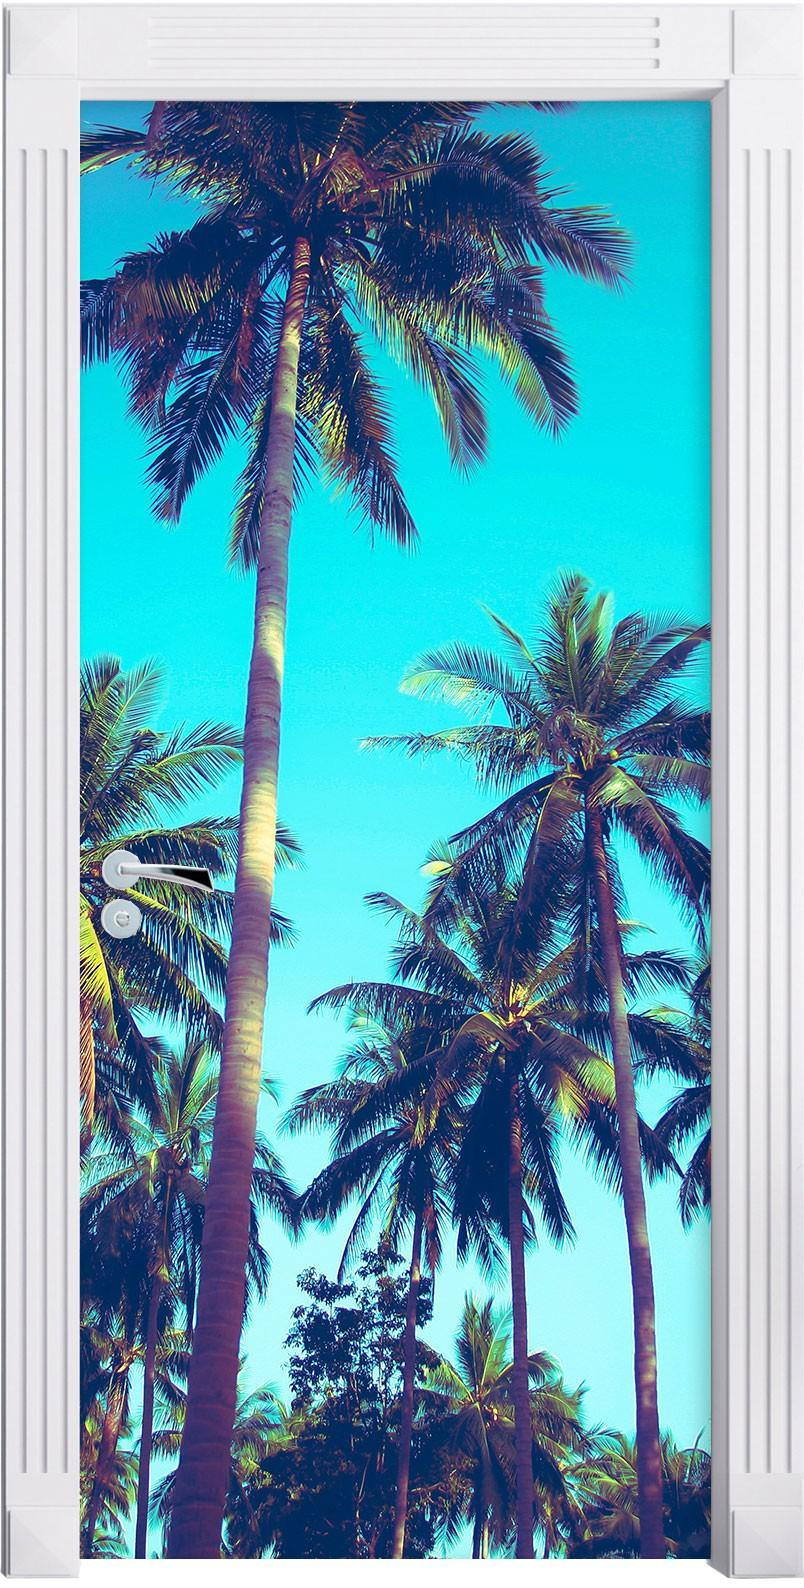 Free Shipping DIY Door Sticker Palm Trees Door Decals Decorations For Bedroom Living Room Wallpapers Decal Home Accessories